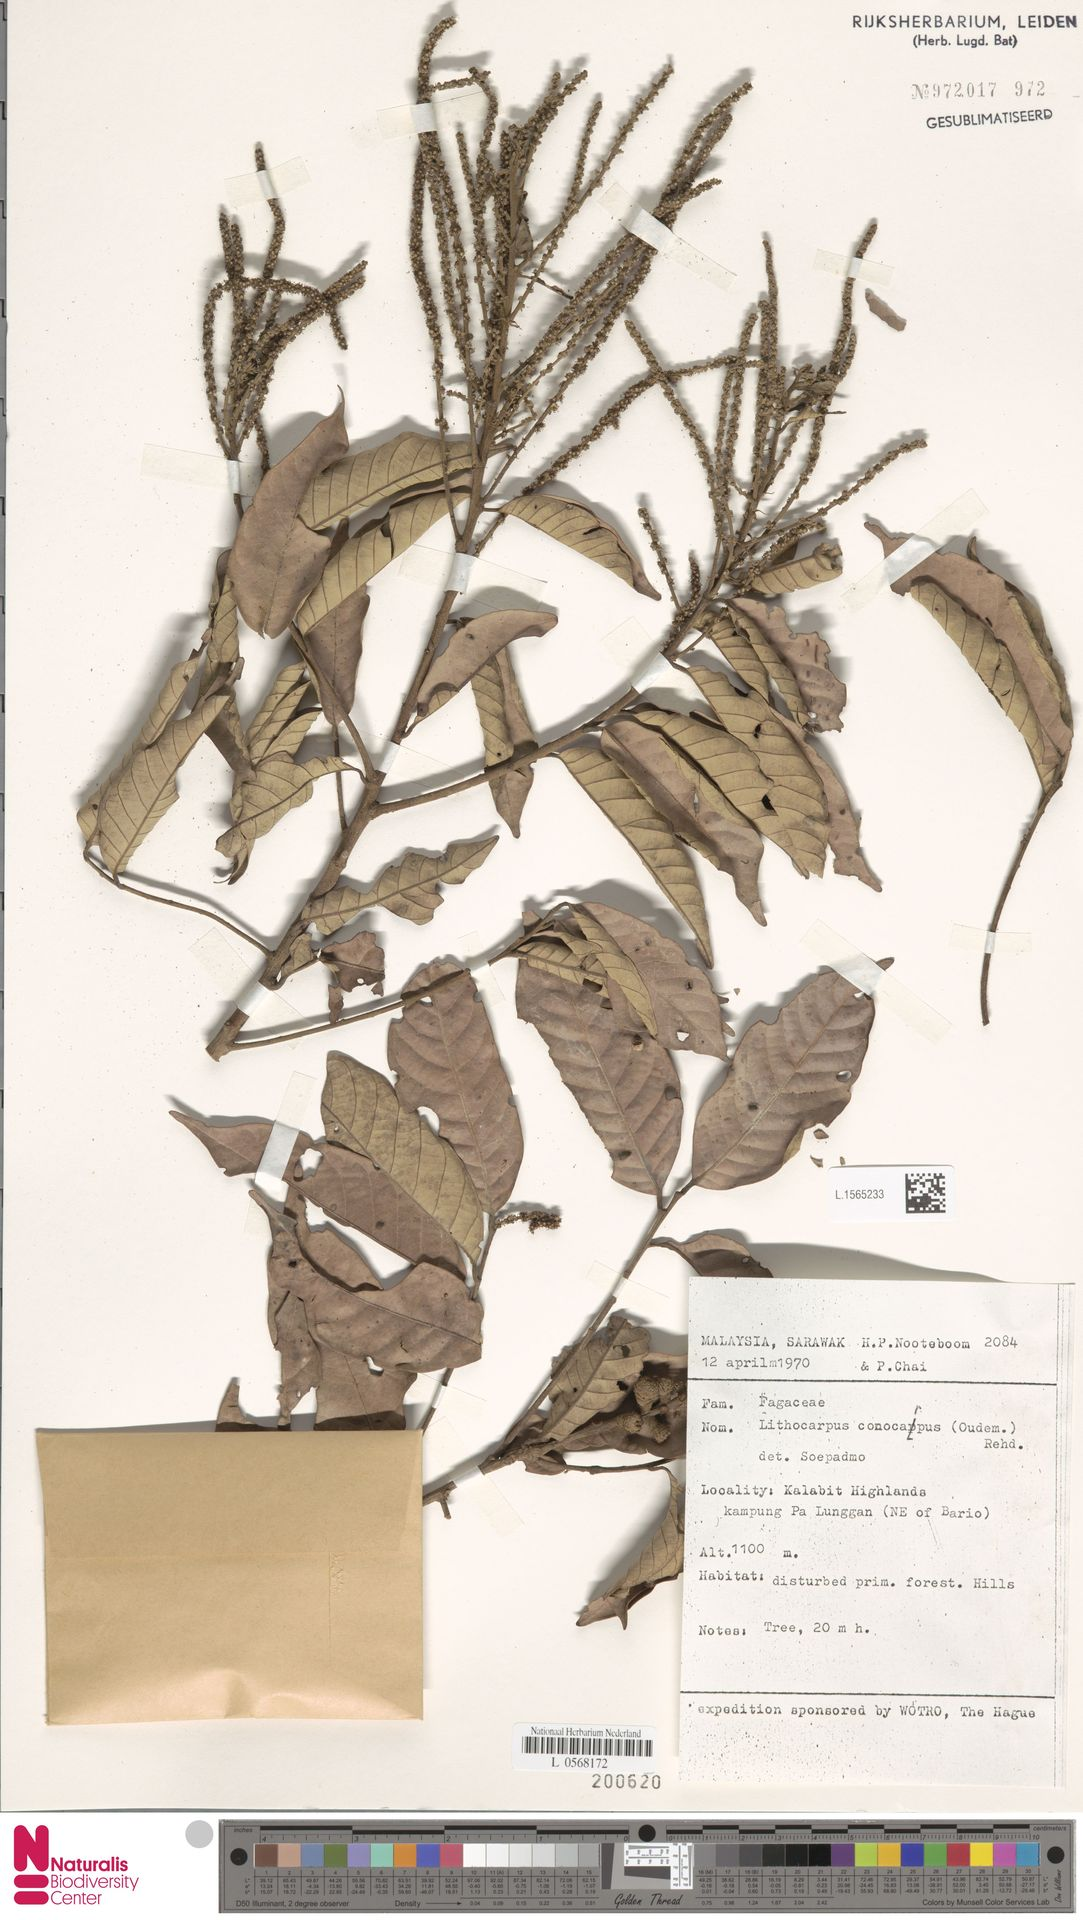 L.1565233 | Lithocarpus conocarpus (Oudem.) Rehder